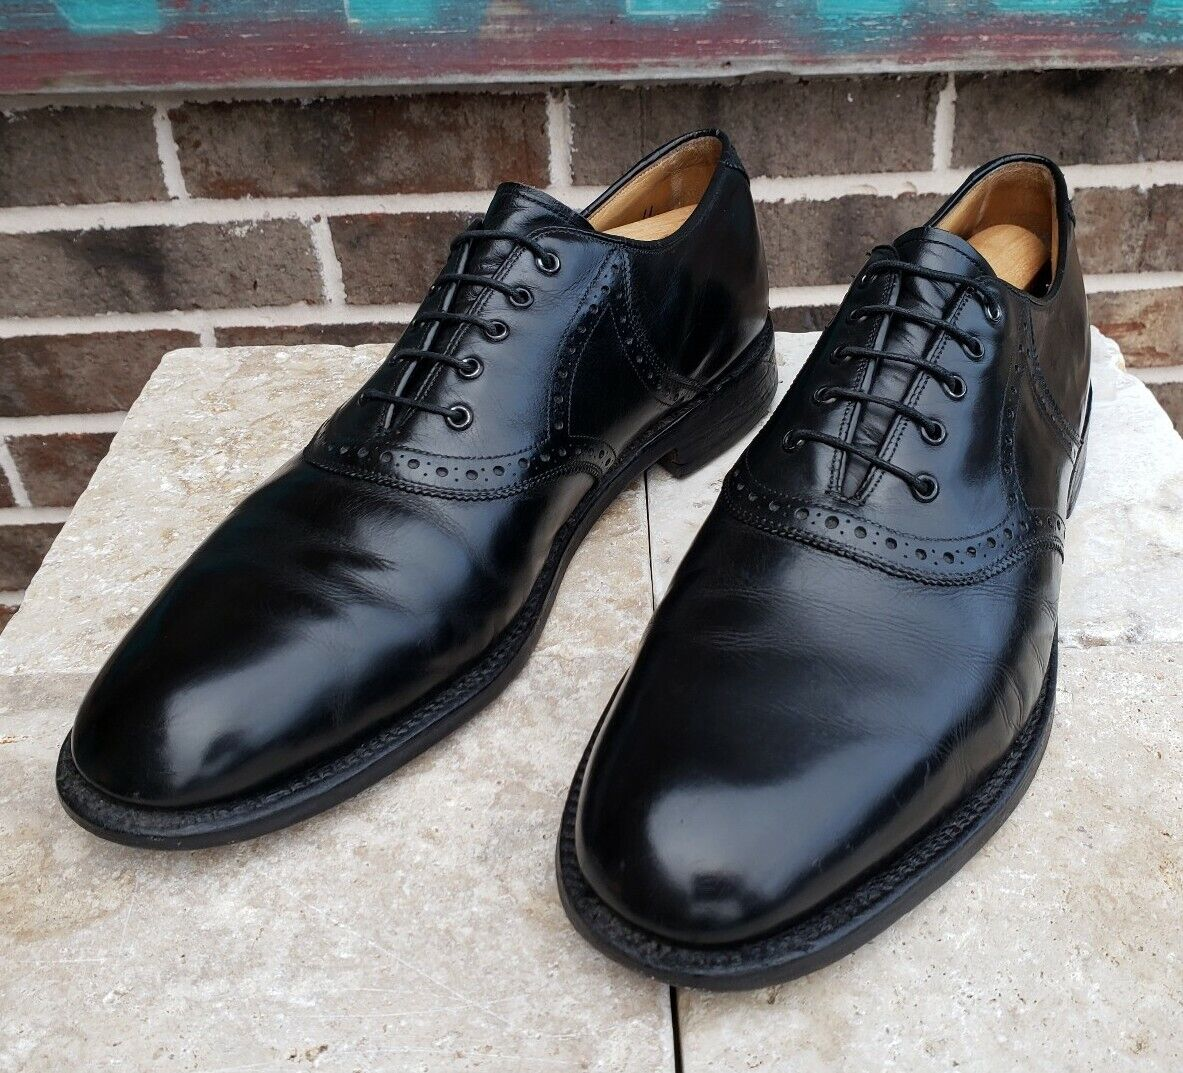 Johnston and Murphy Aristocraft 24-8571 Size 11.5 B/2A Black Oxford